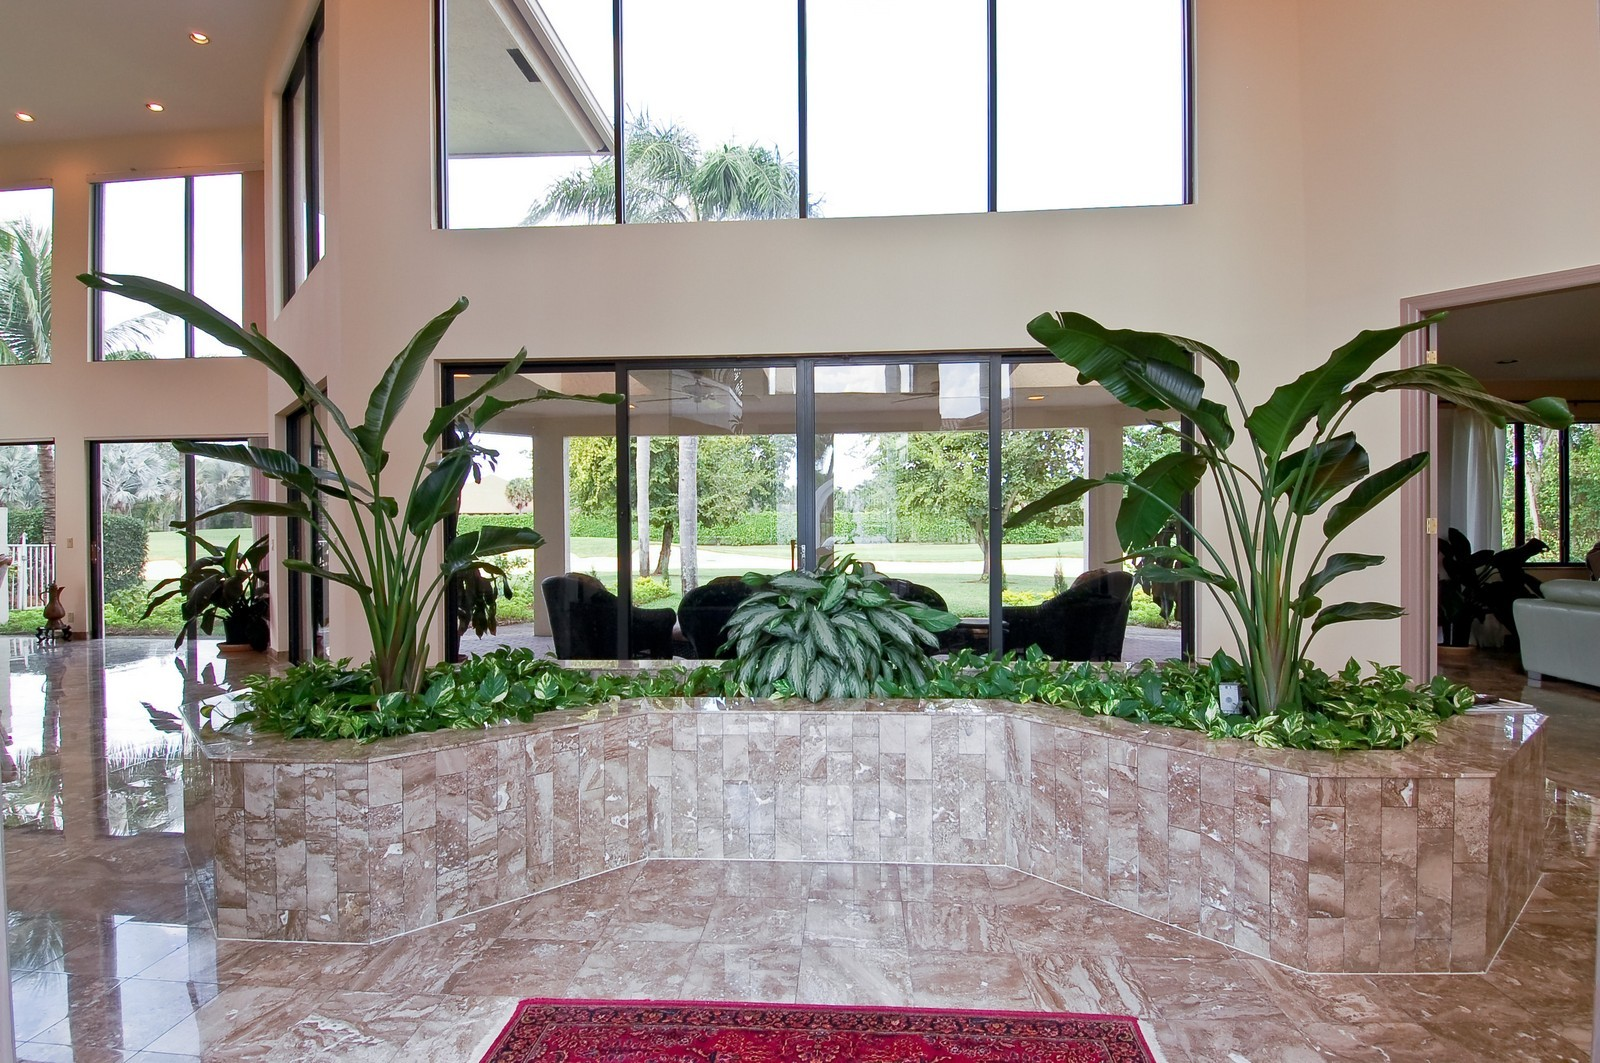 Real Estate Photography - 7339 Mandarin, Boca Raton, FL, 33433 - Location 1